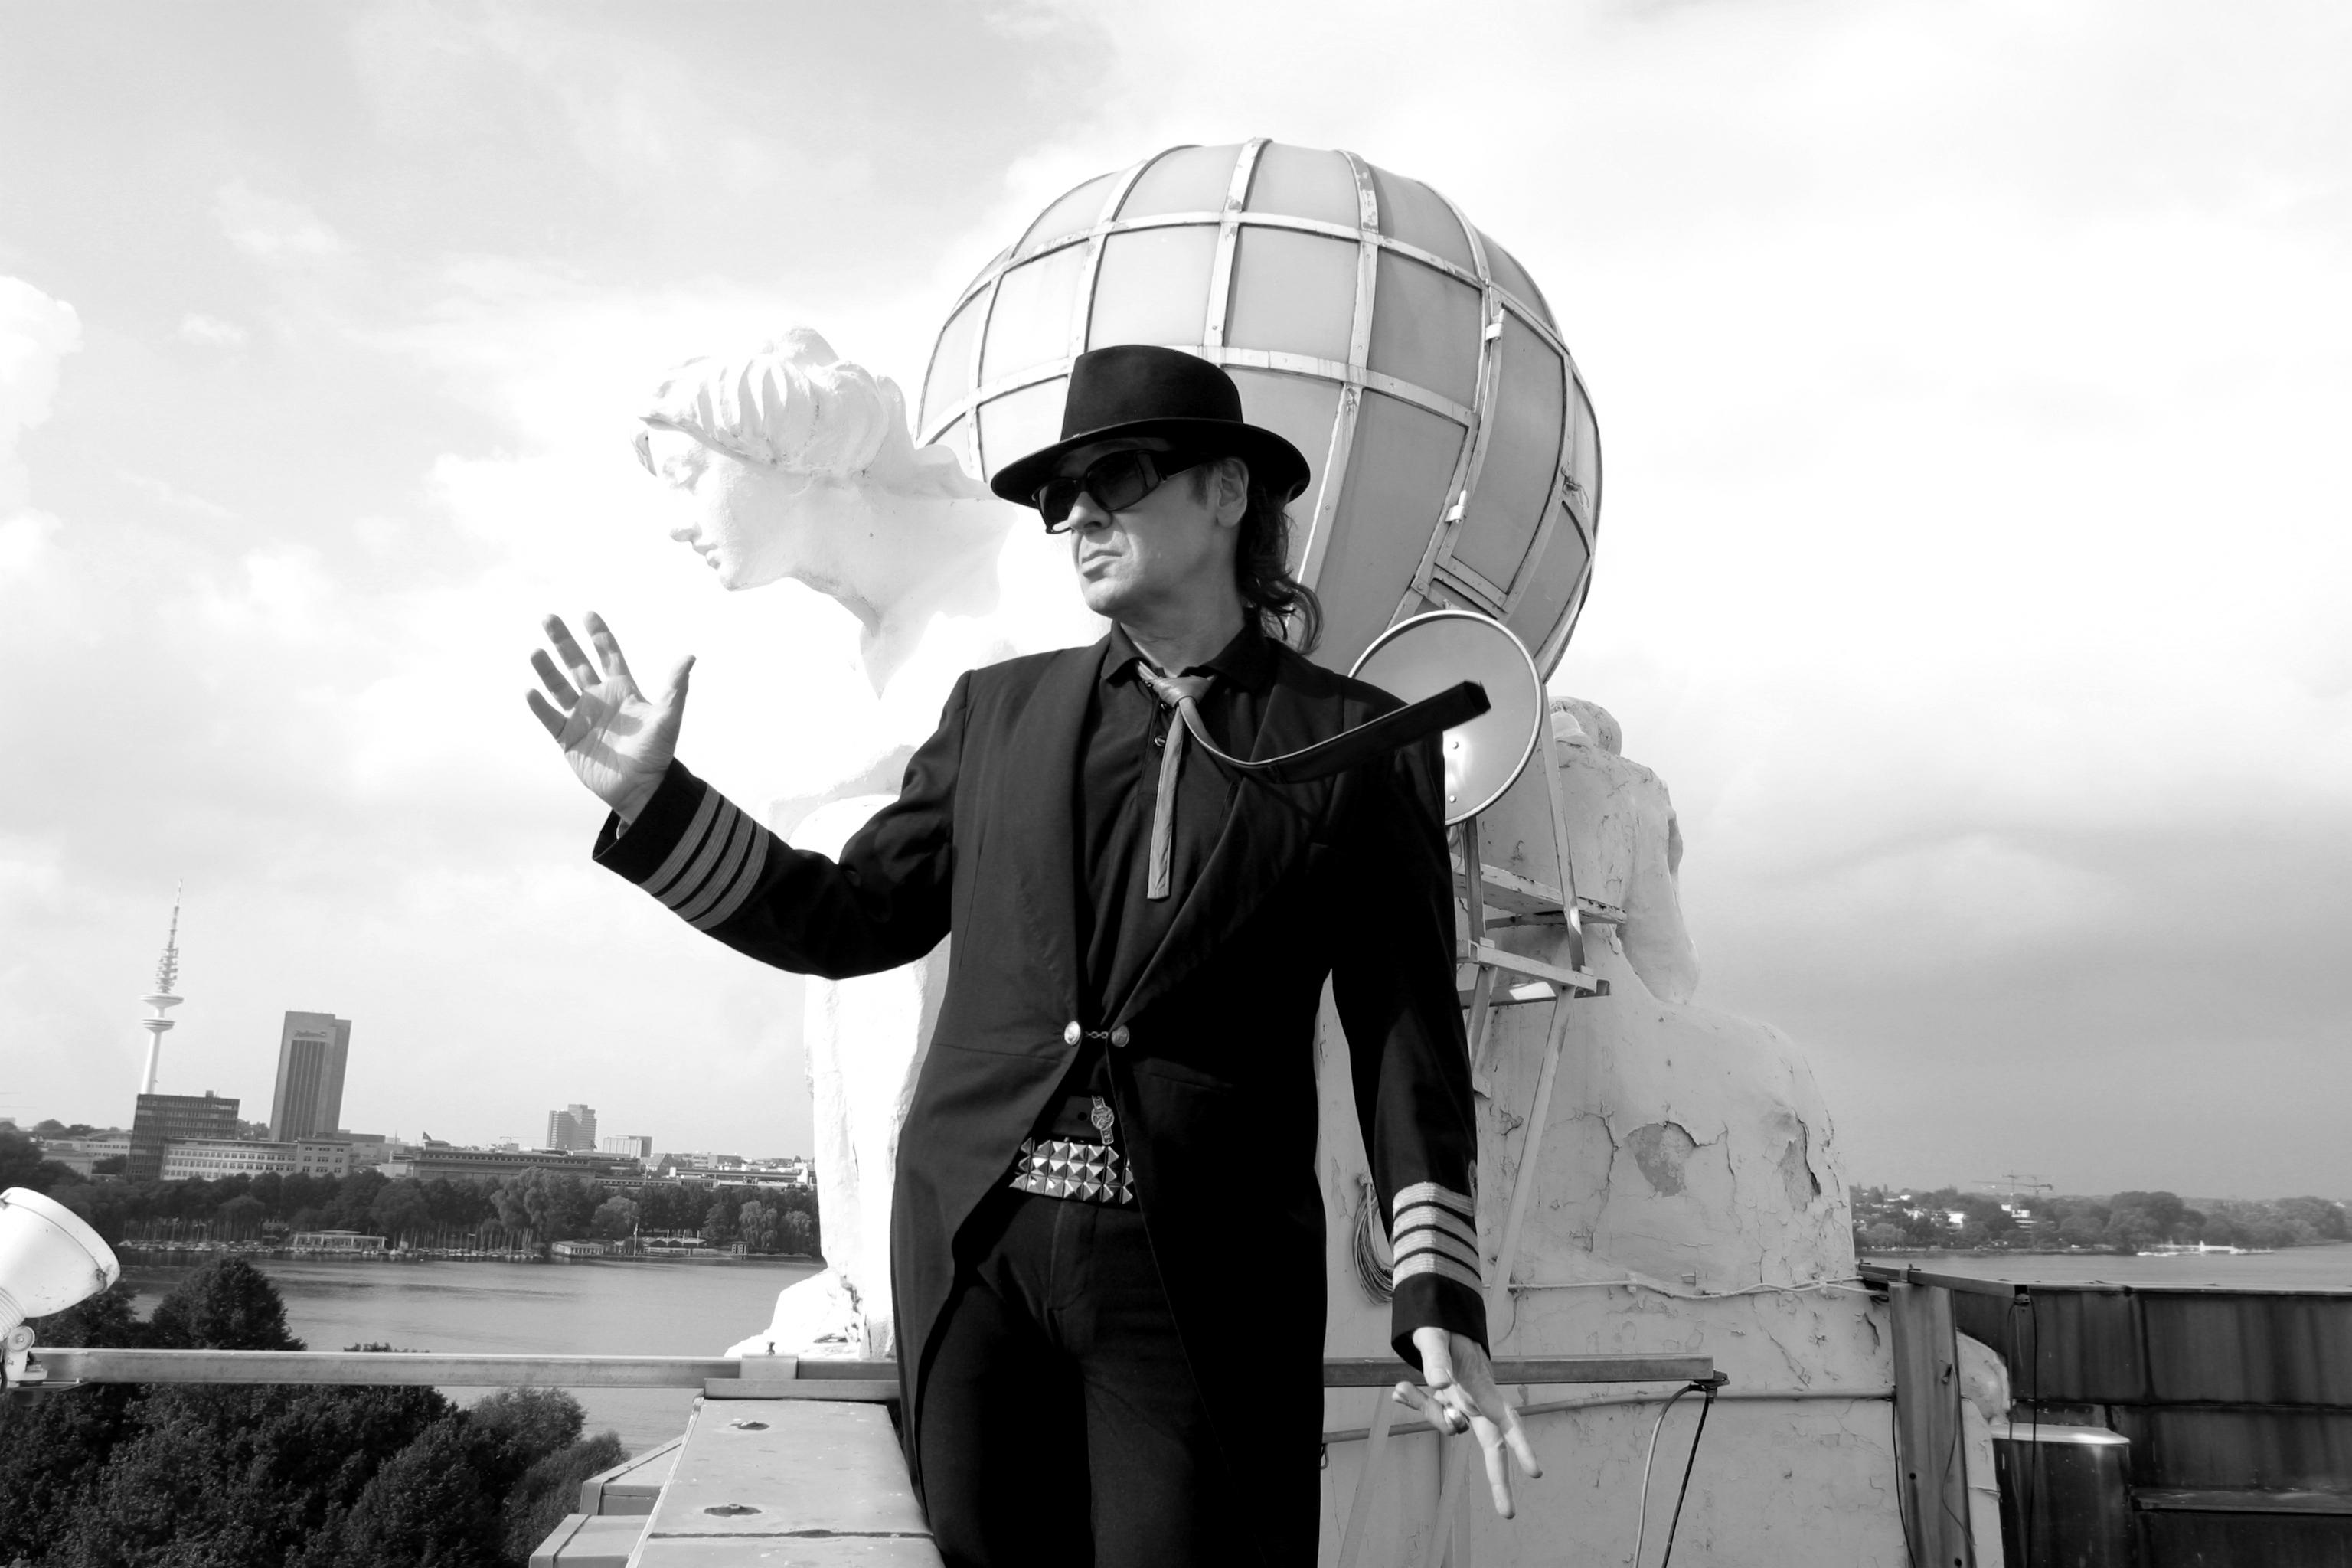 Udo Lindenberg auf dem Hoteldach des Atlantic Hotels mit Weltkugel